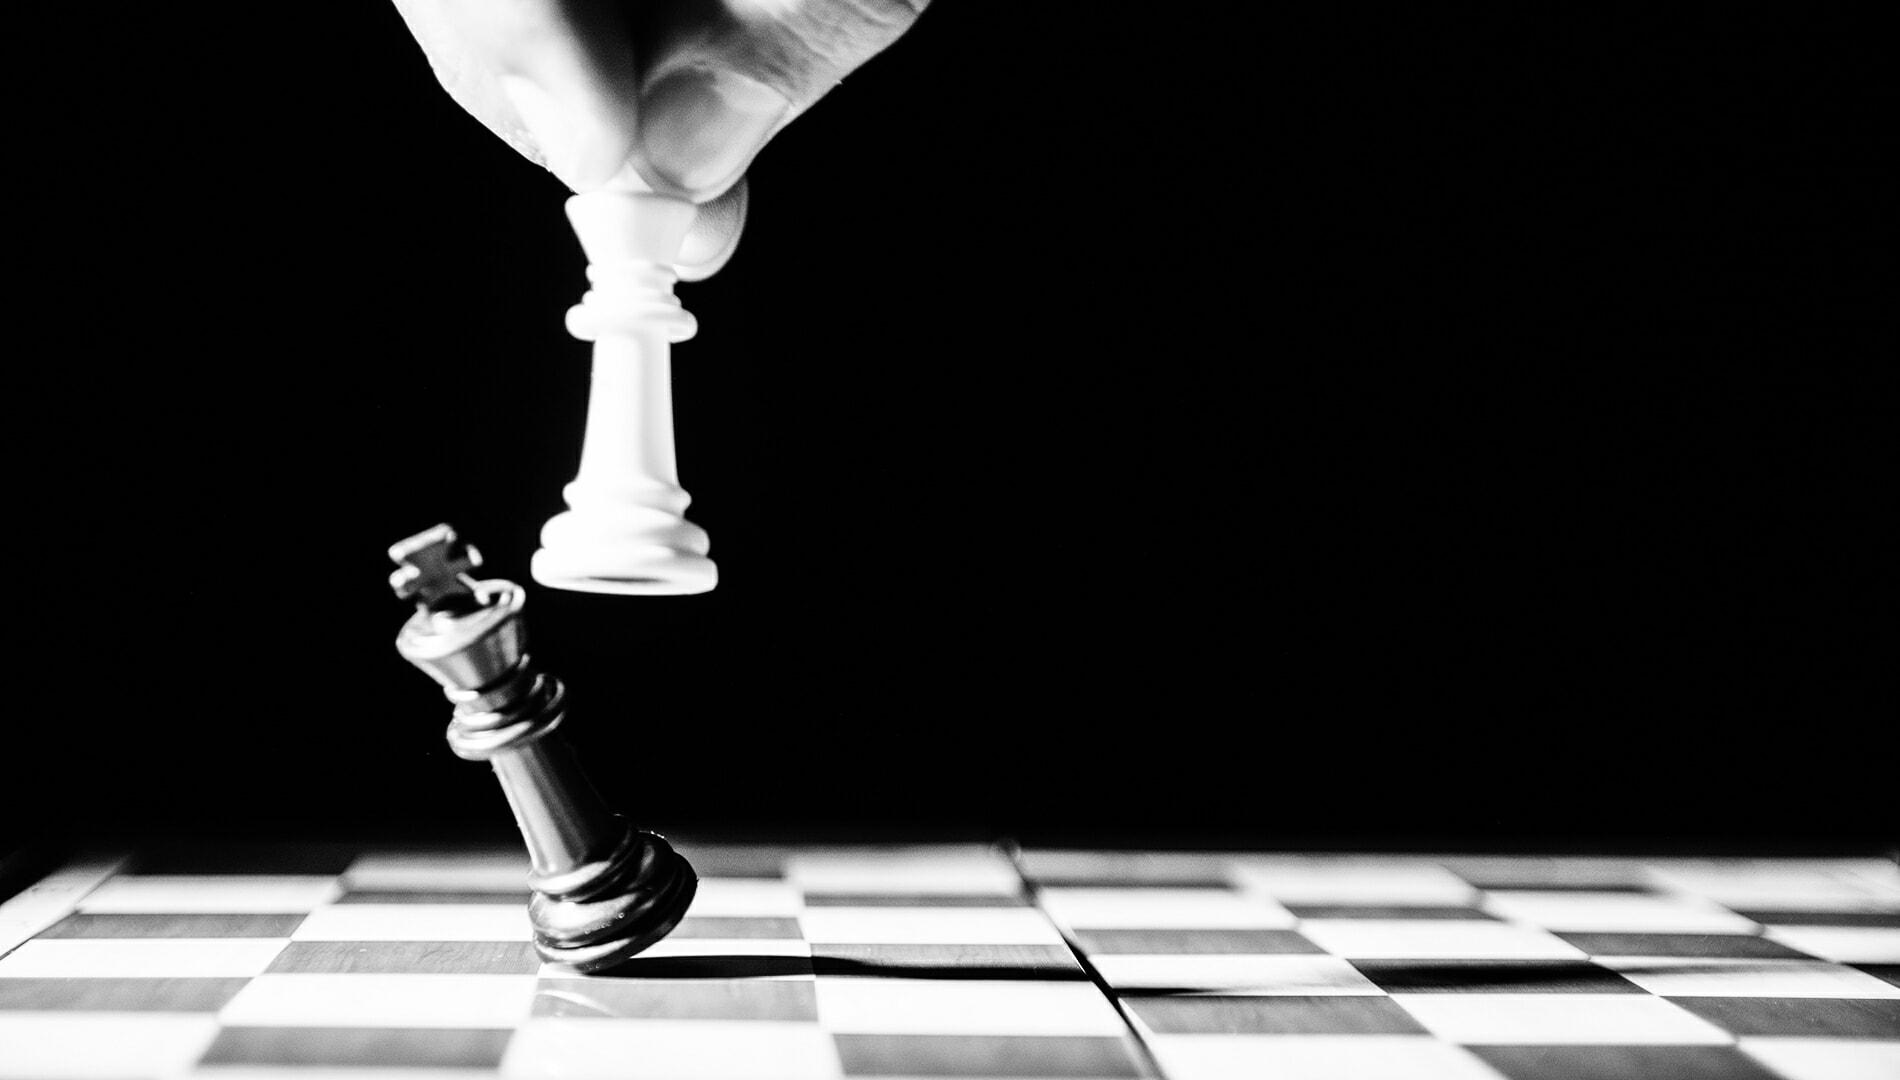 White king chess piece knocking down a black king piece